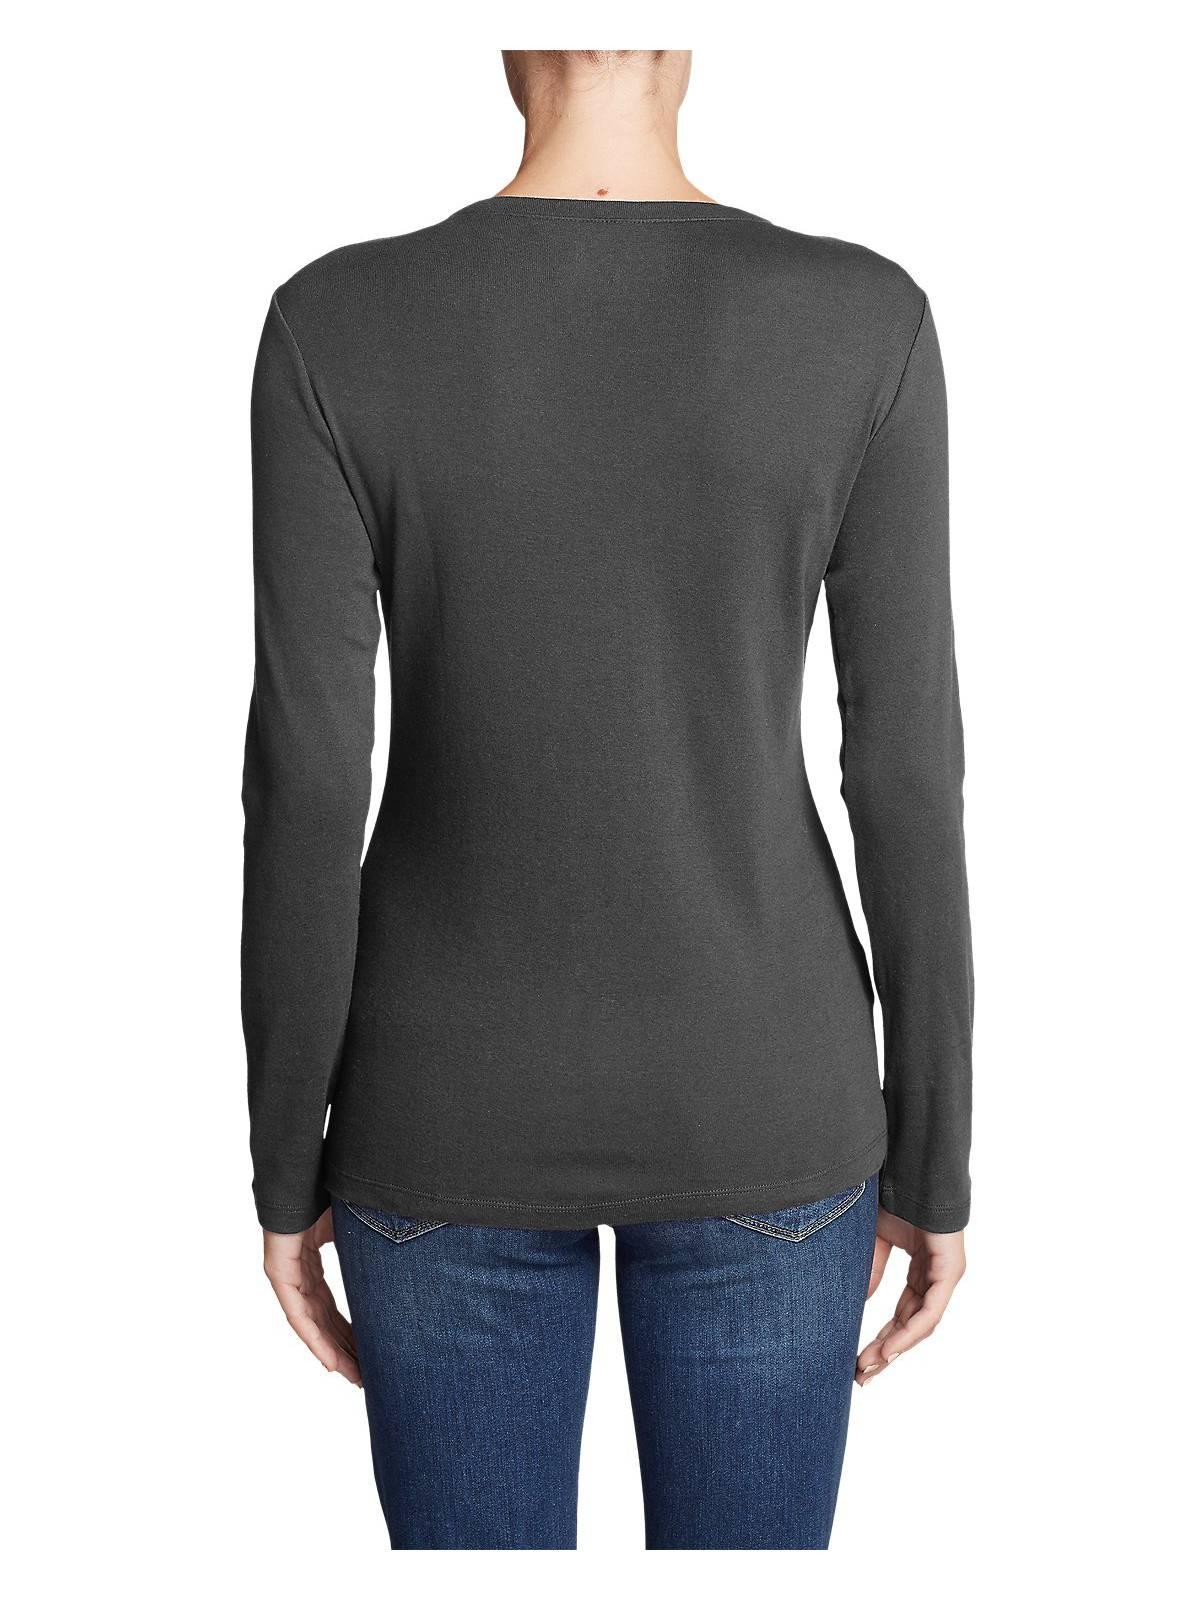 Eddie-Bauer-Women-039-s-Favorite-Long-Sleeve-V-Neck-T-Shirt thumbnail 21